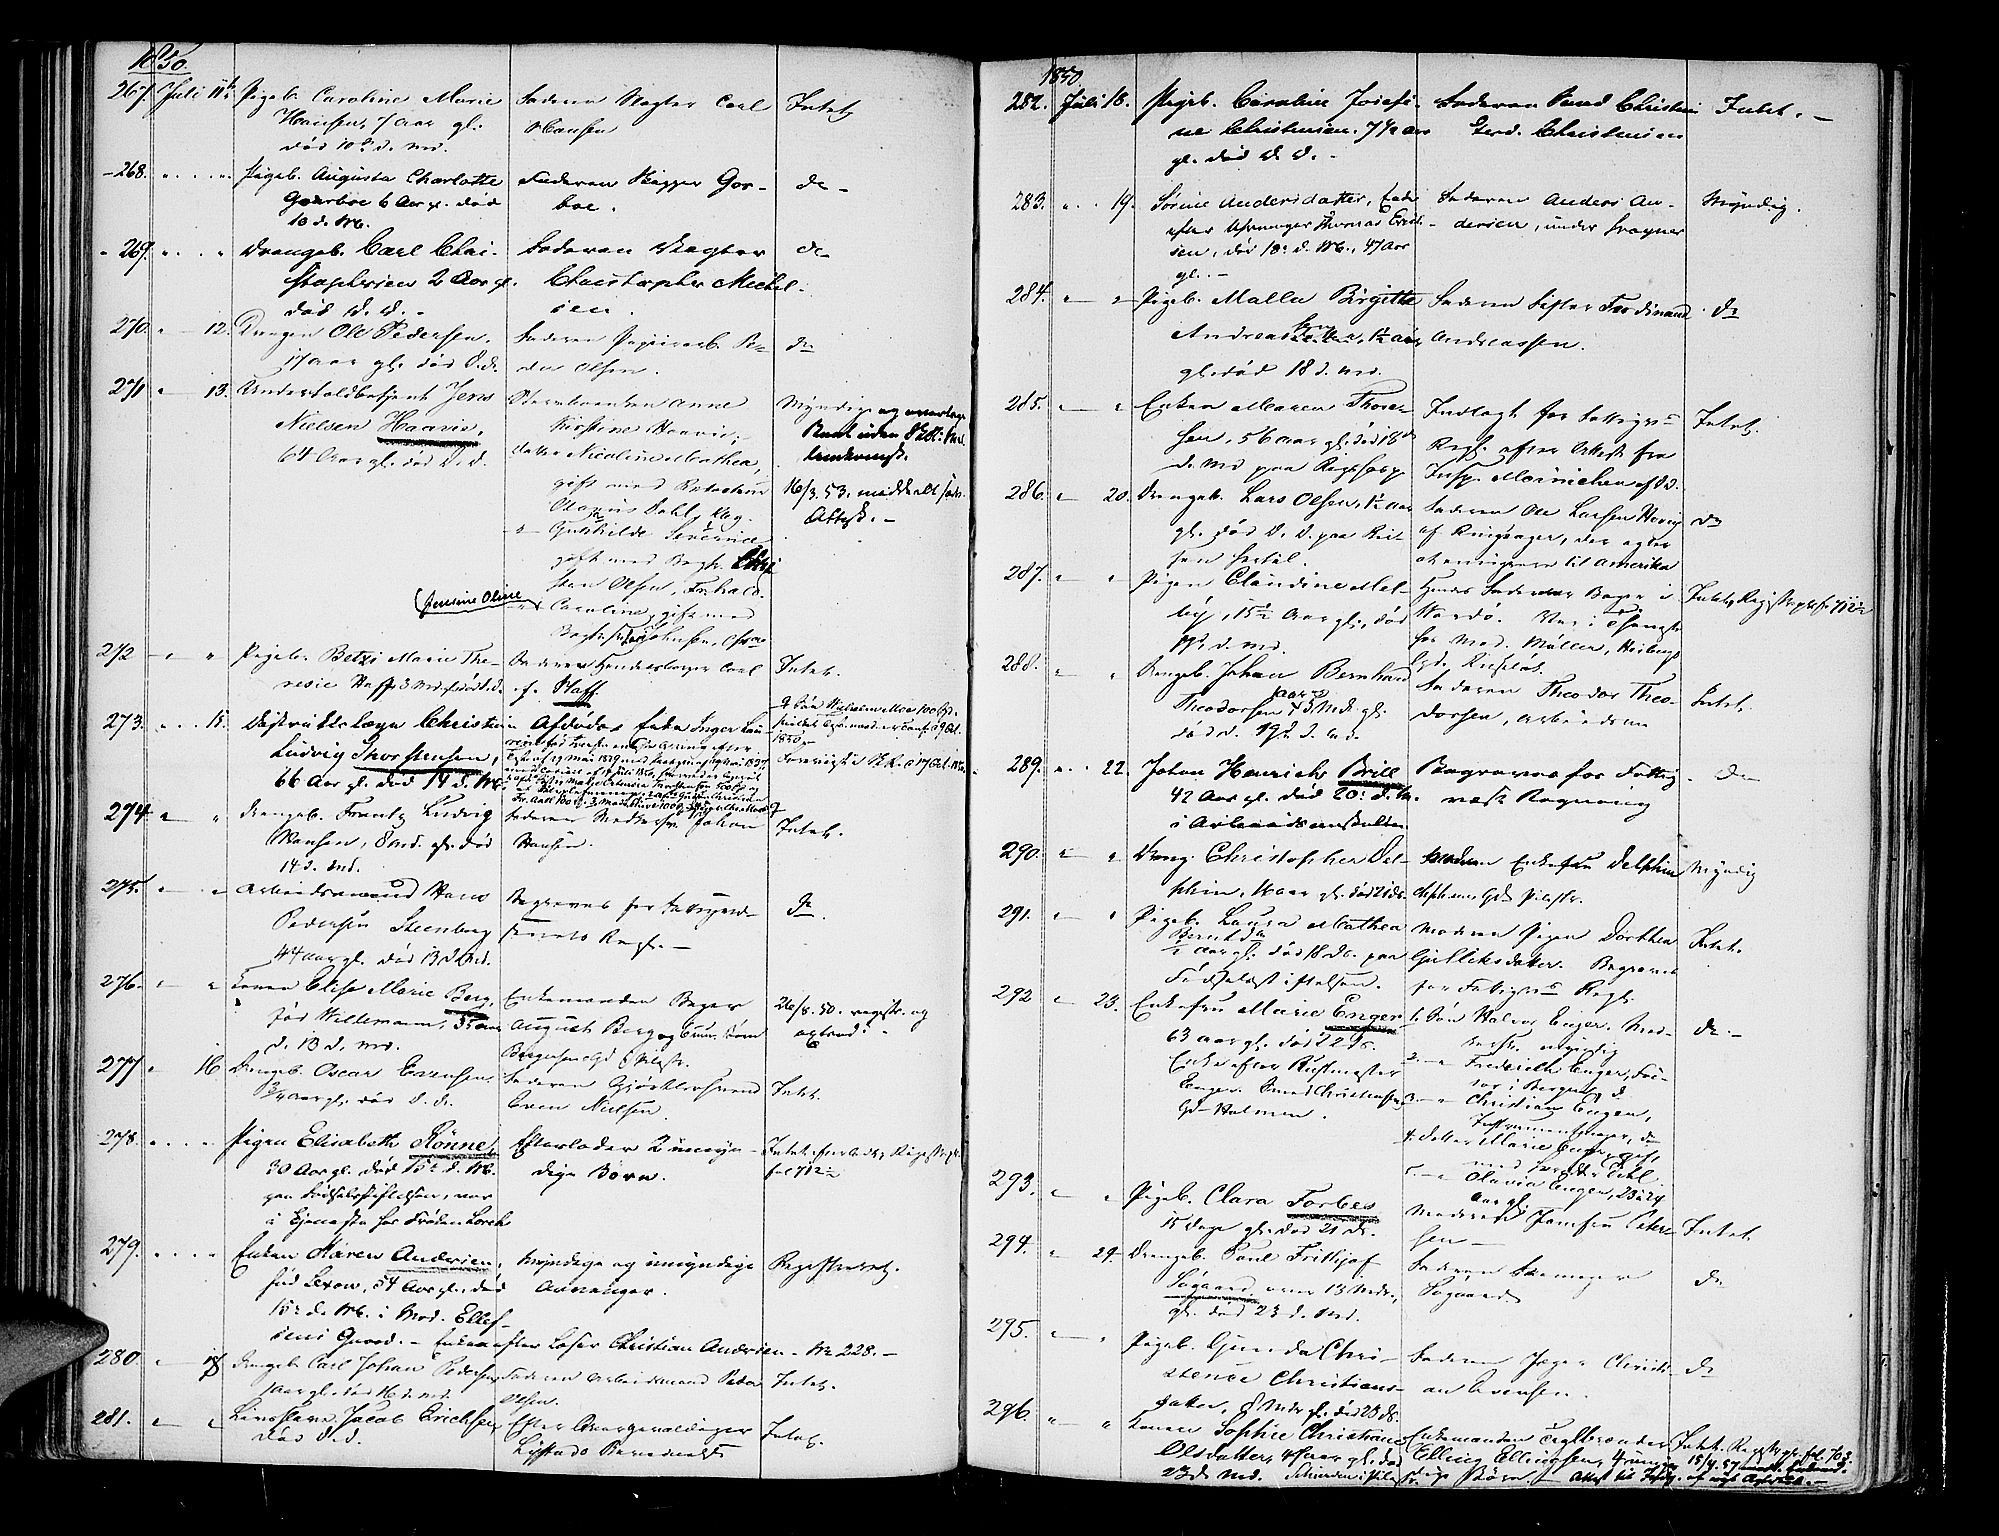 SAO, Oslo skifterett, G/Ga/Gaa/L0004: Dødsfallsprotokoll, 1846-1853